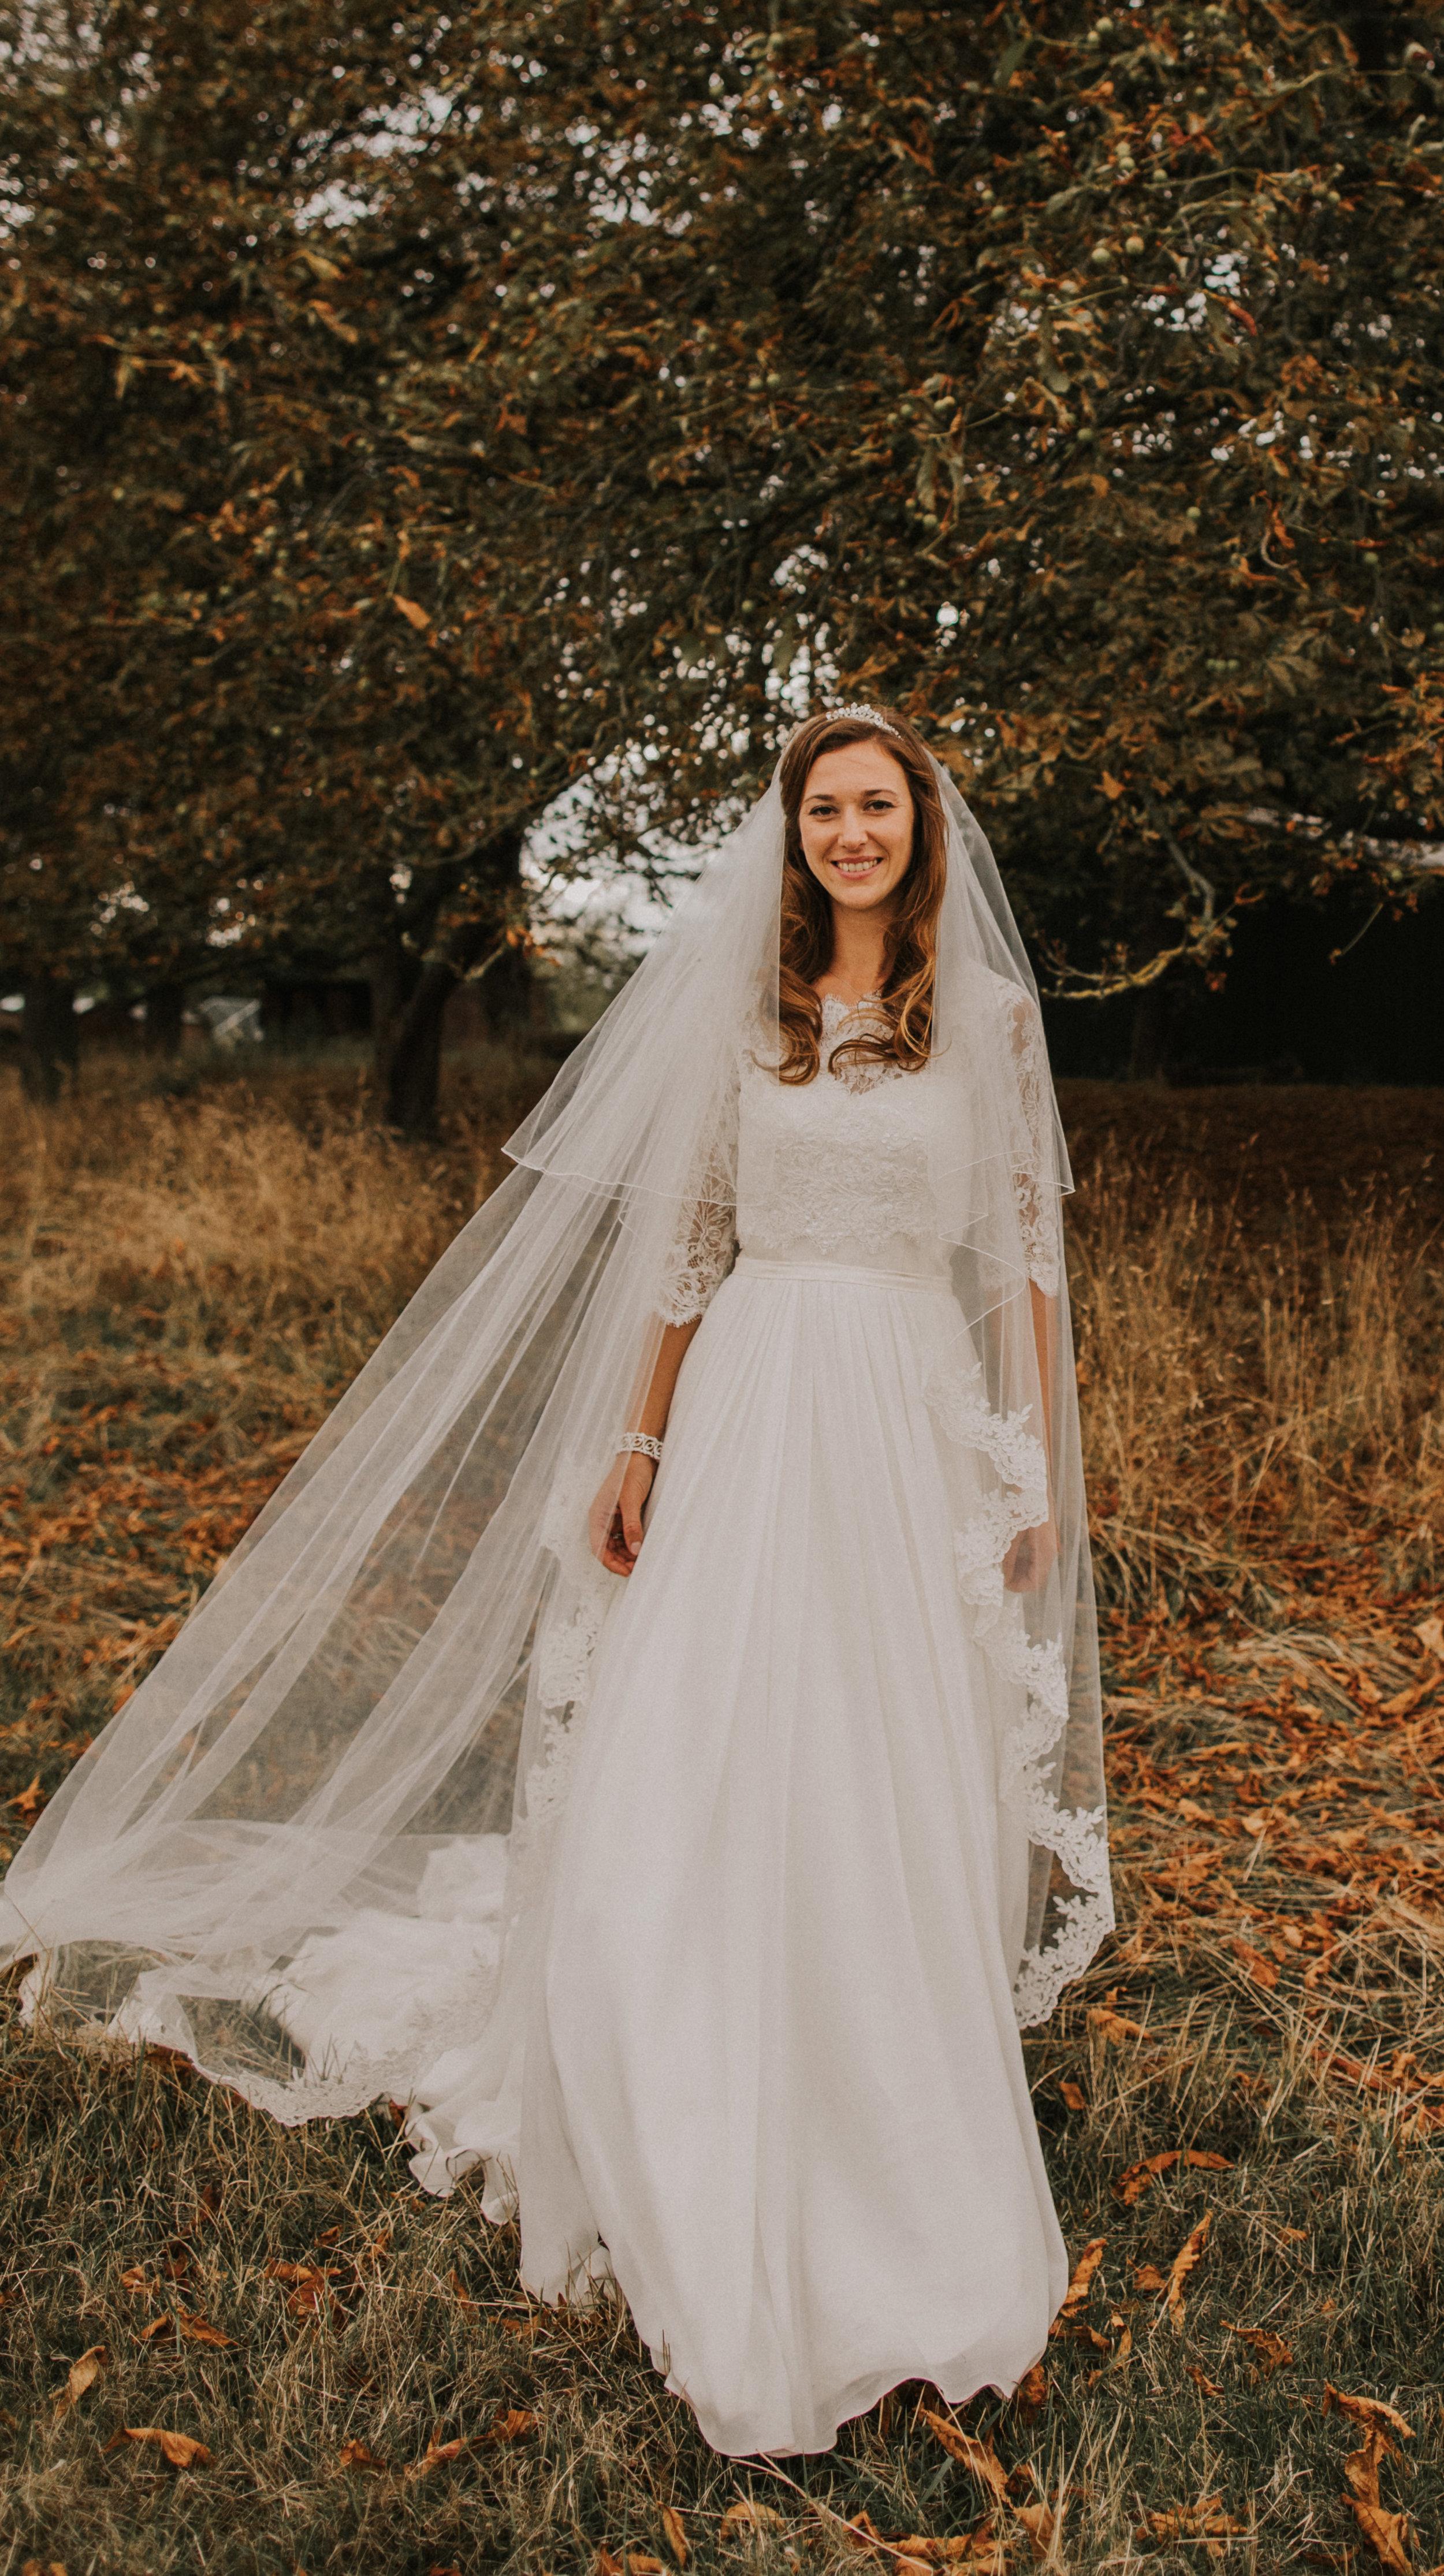 brook rose photography  Farm wedding_204.jpg